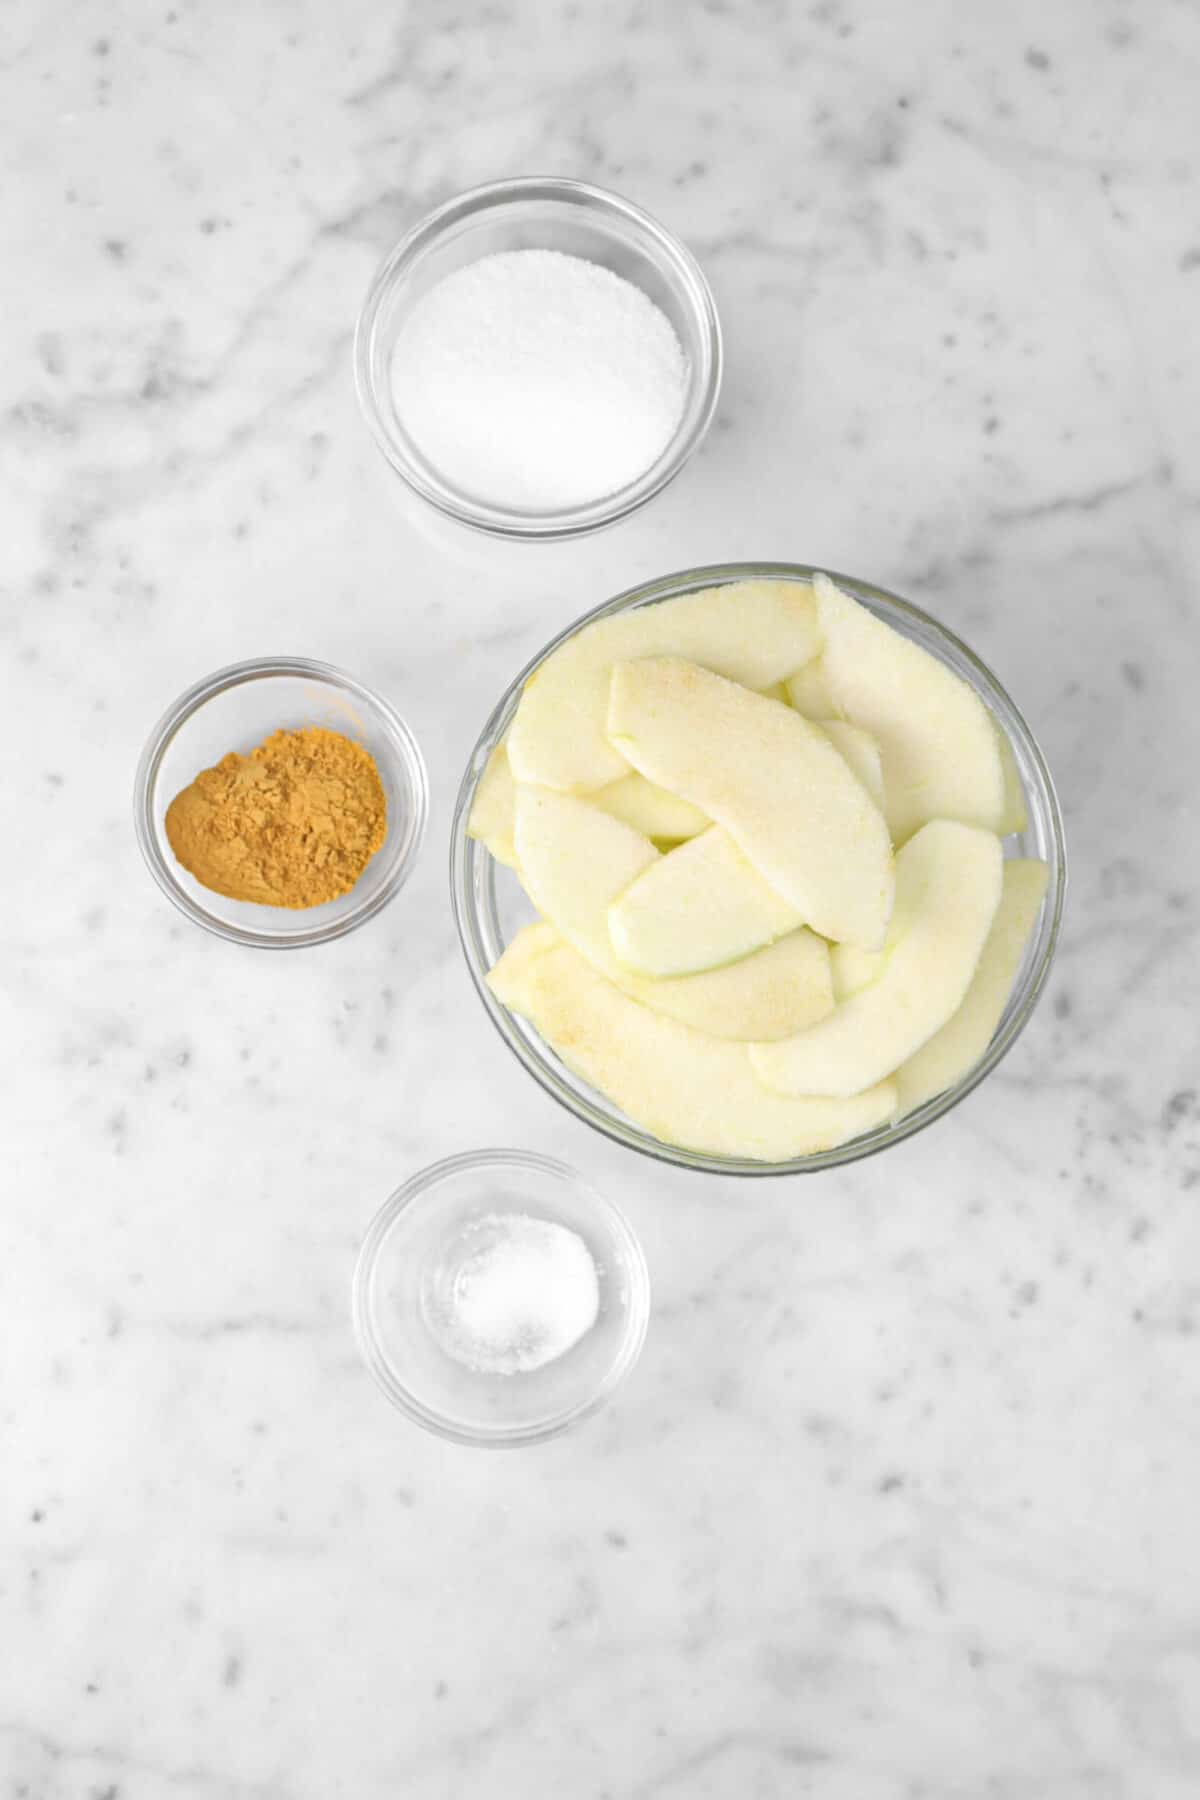 sliced apples, sugar, cinnamon, and salt in bowls